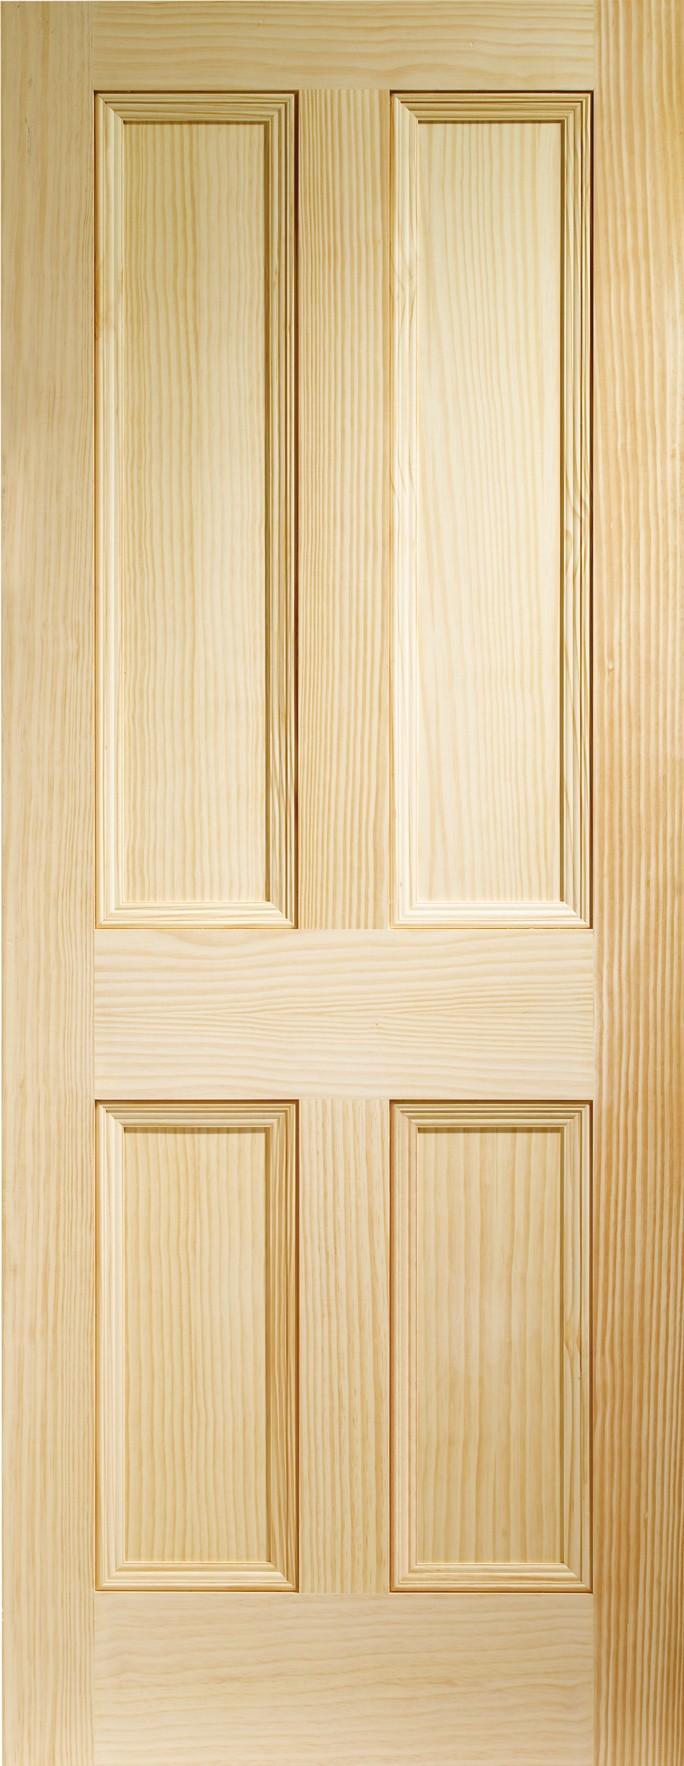 XL JOINERY DOORS -  VGEDW4P28  Internal Vertical Grain Clear Pine Edwardian 4 Panel  VGEDW4P28